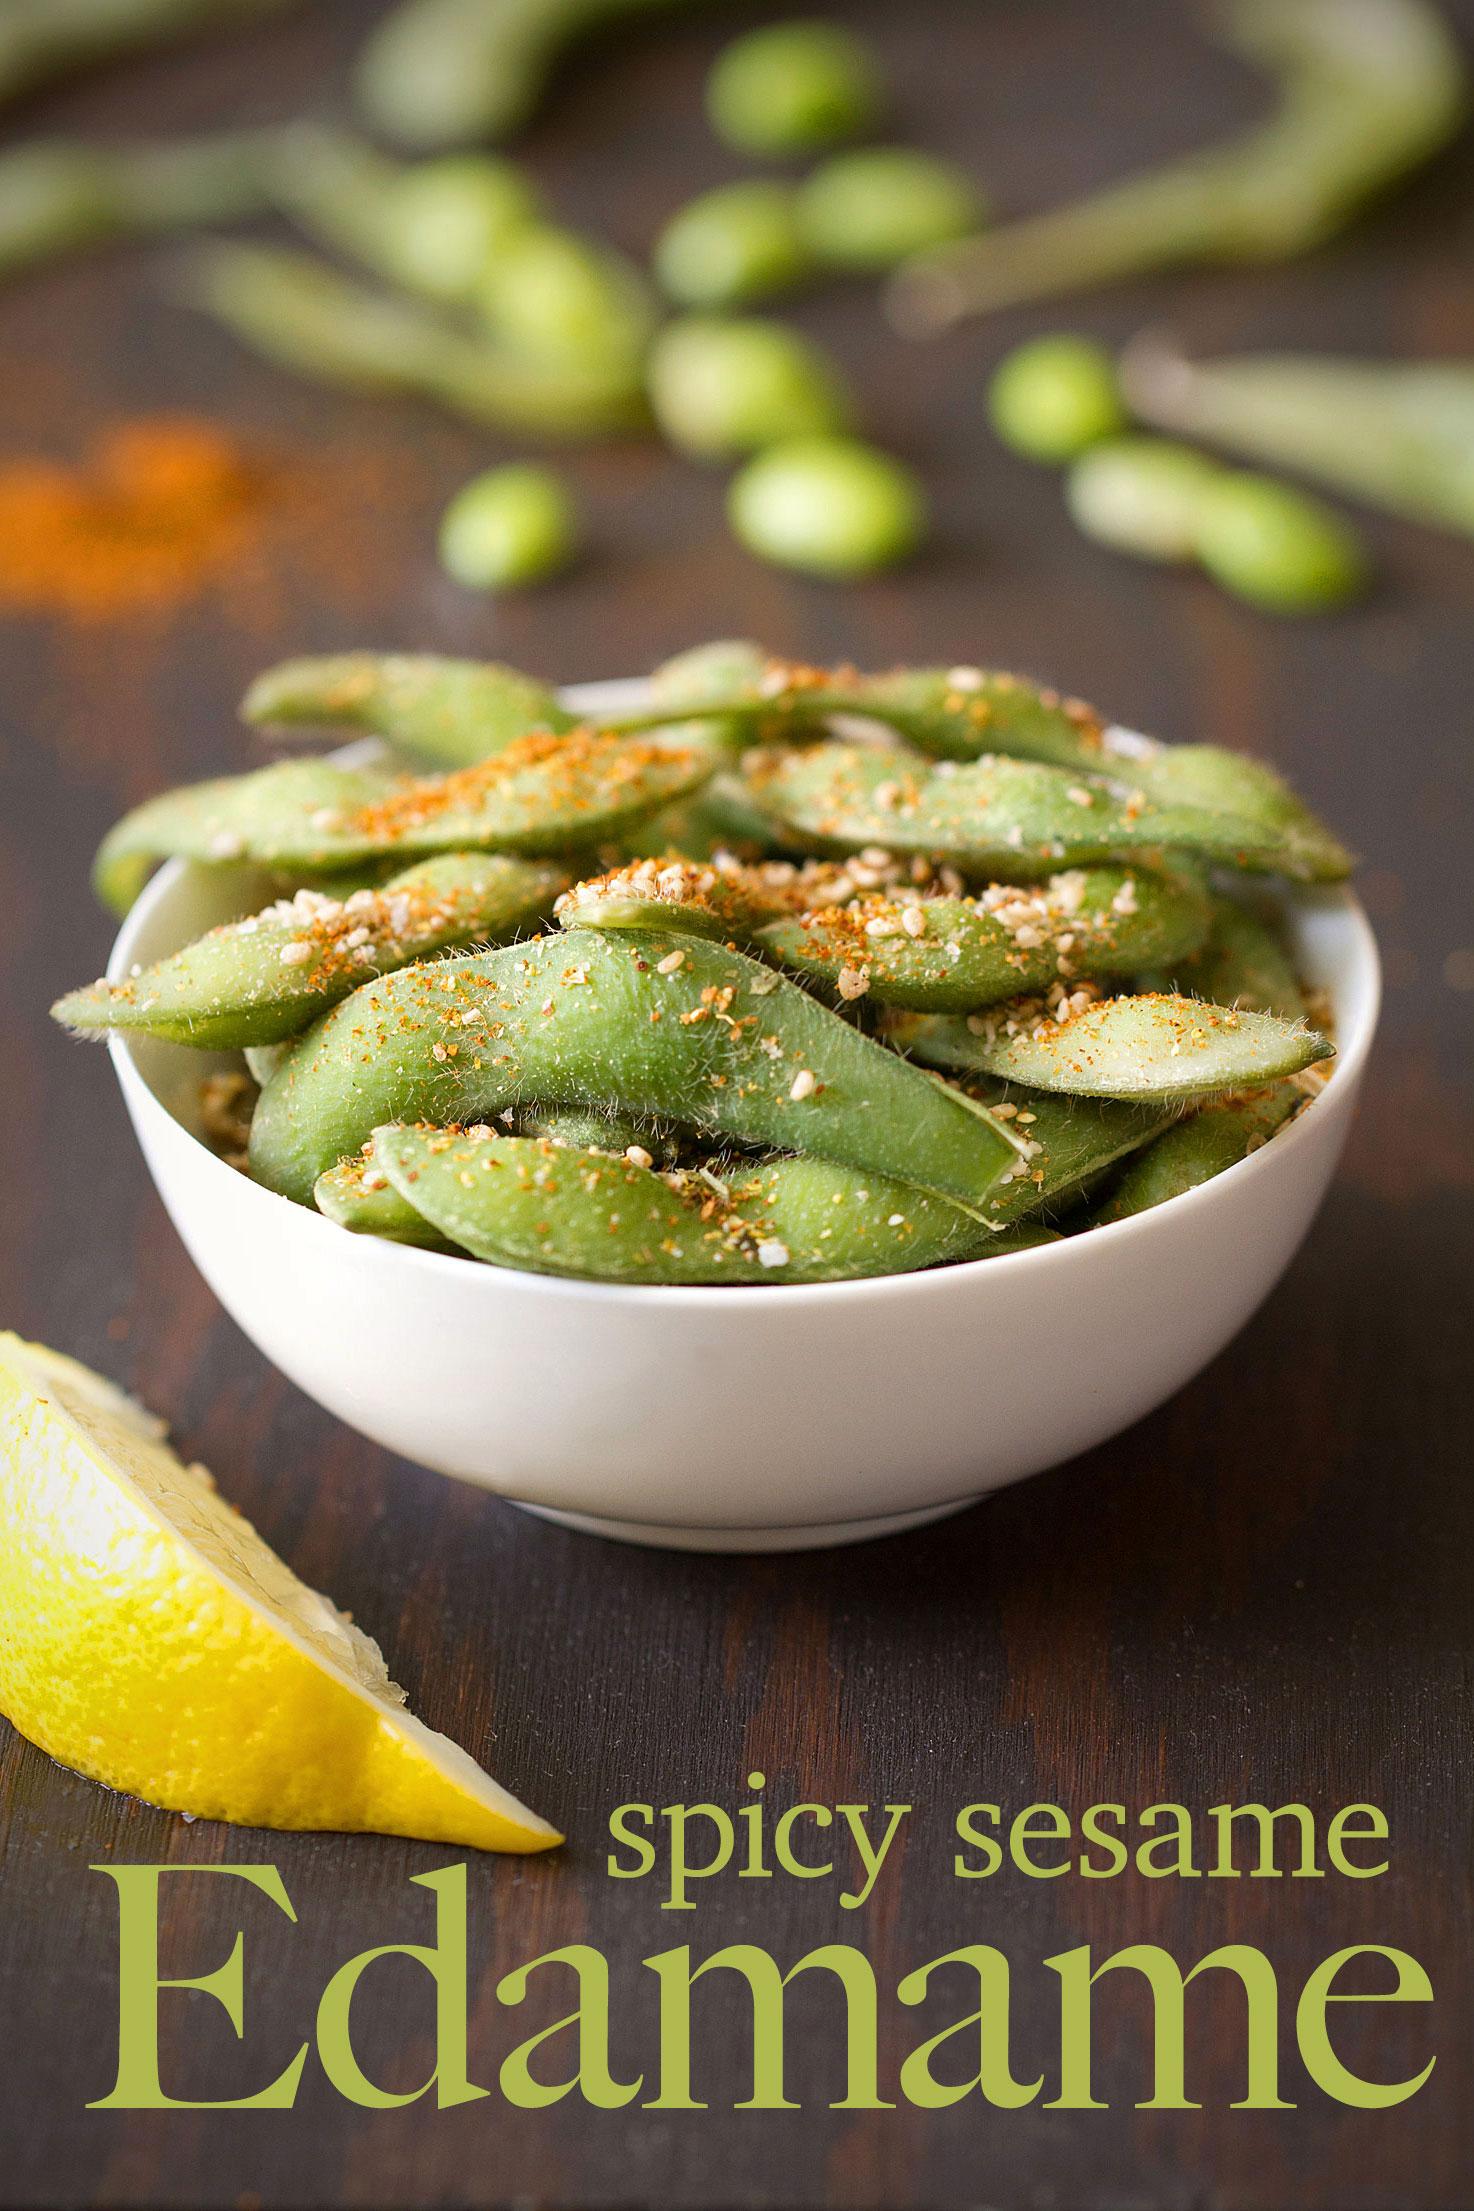 Spicy Sesame Edamame